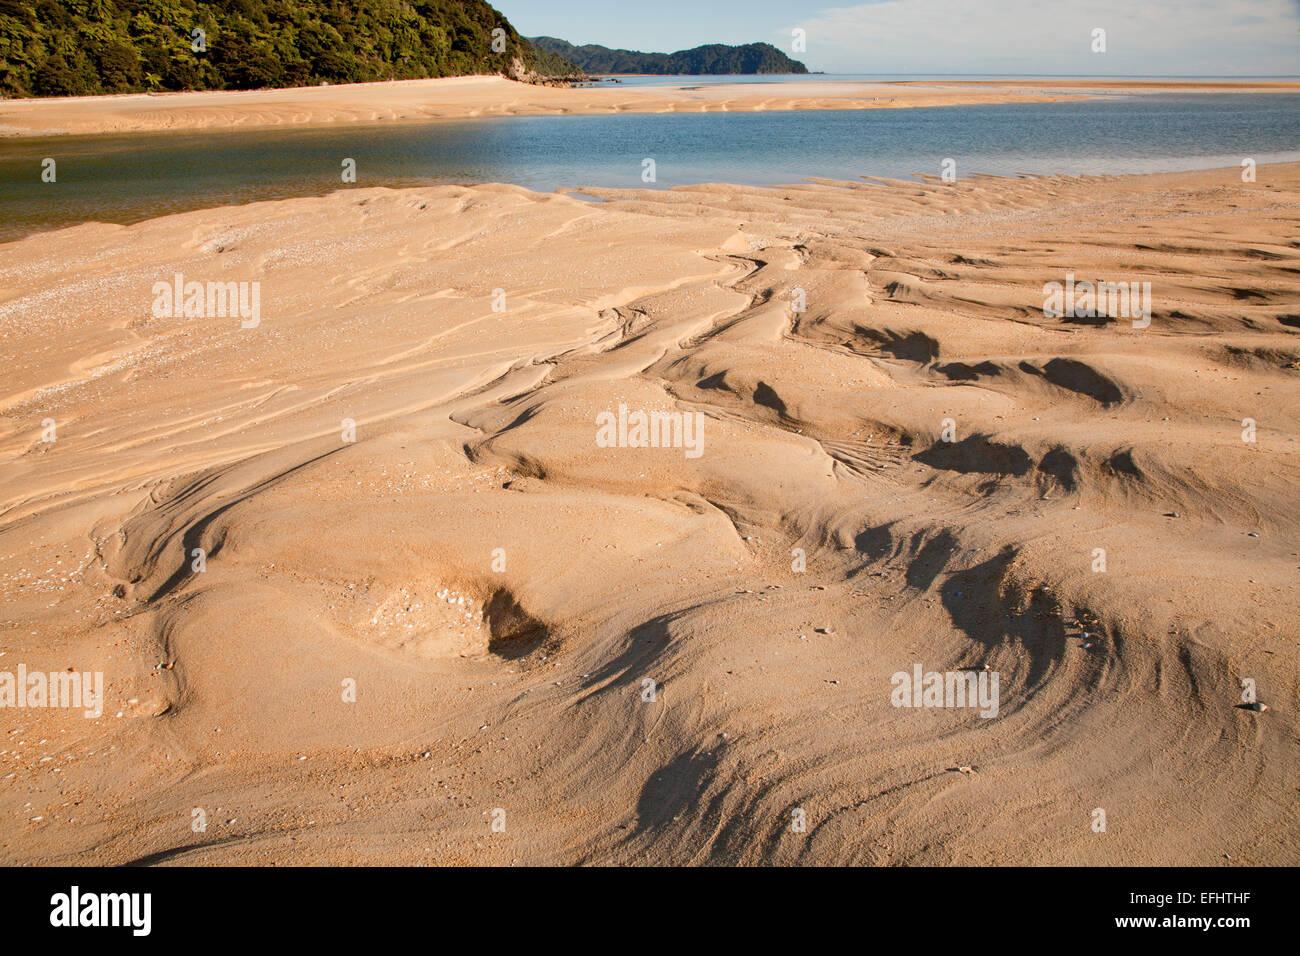 Sandbank, with ripples in golden sand, Awaroa Inlet, Abel Tasman Coastal Track, Great Walks, north-west of South - Stock Image